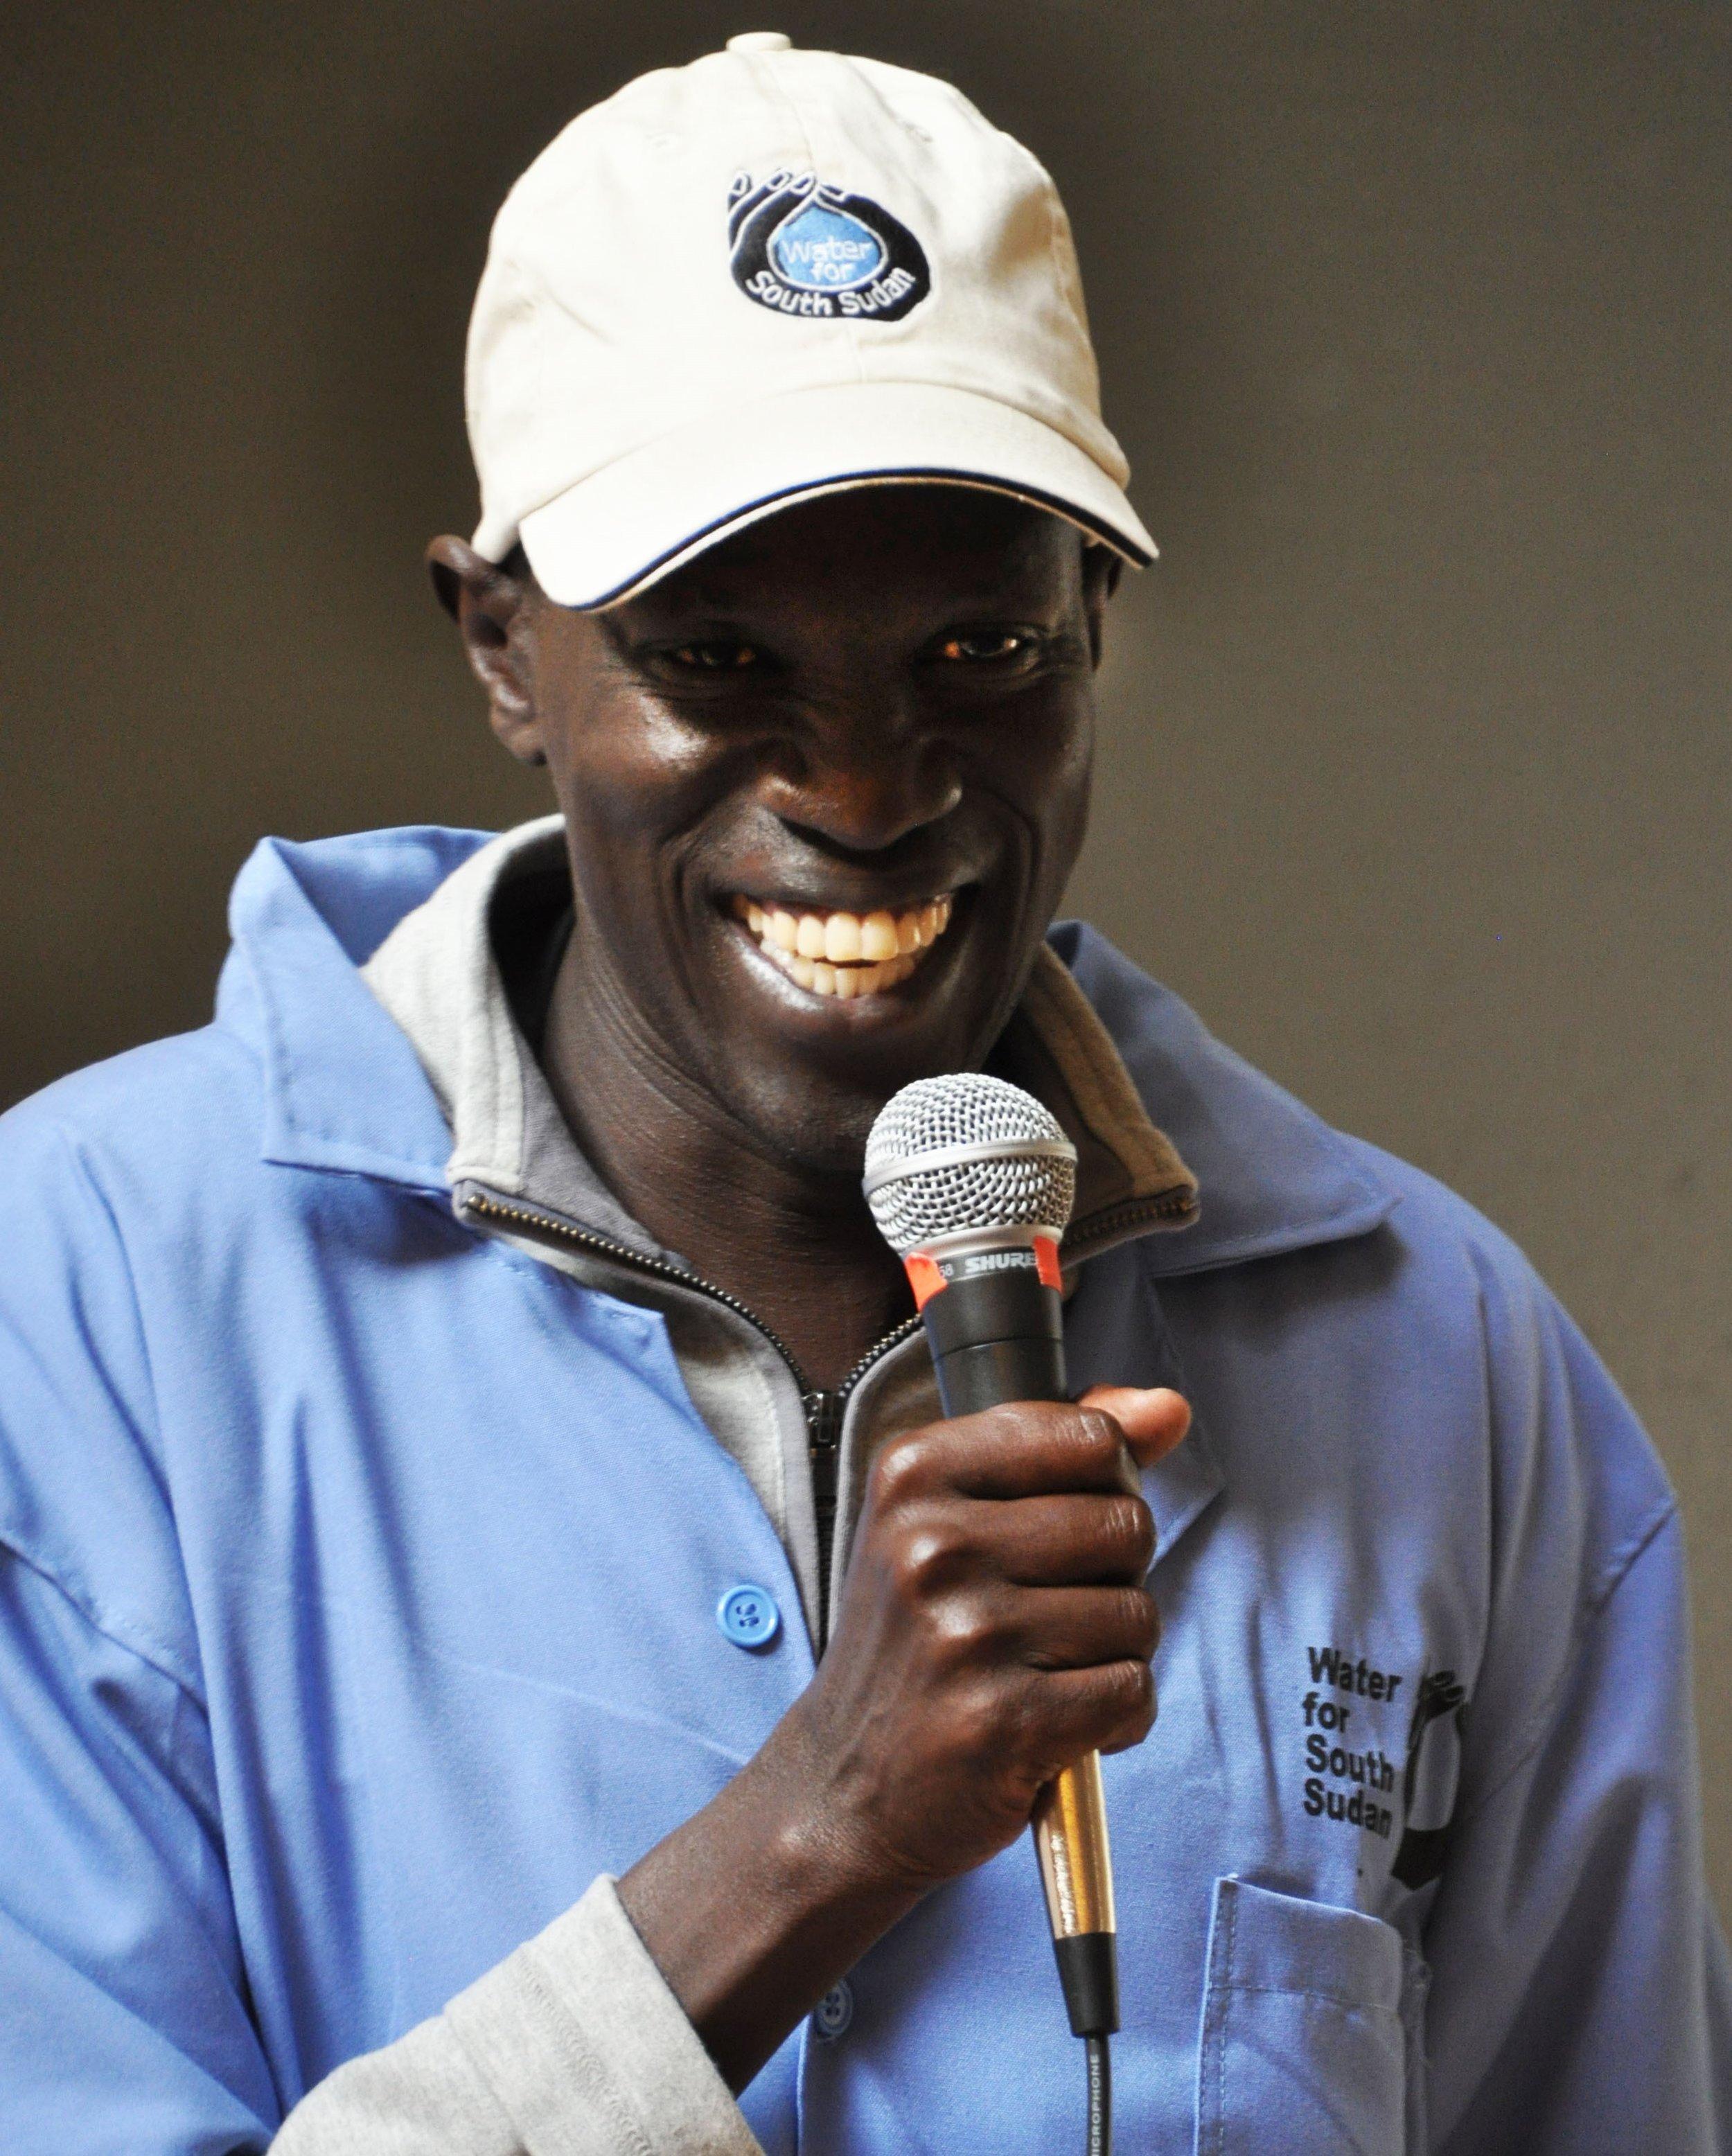 Salva Dut, Founder of Water for South Sudan